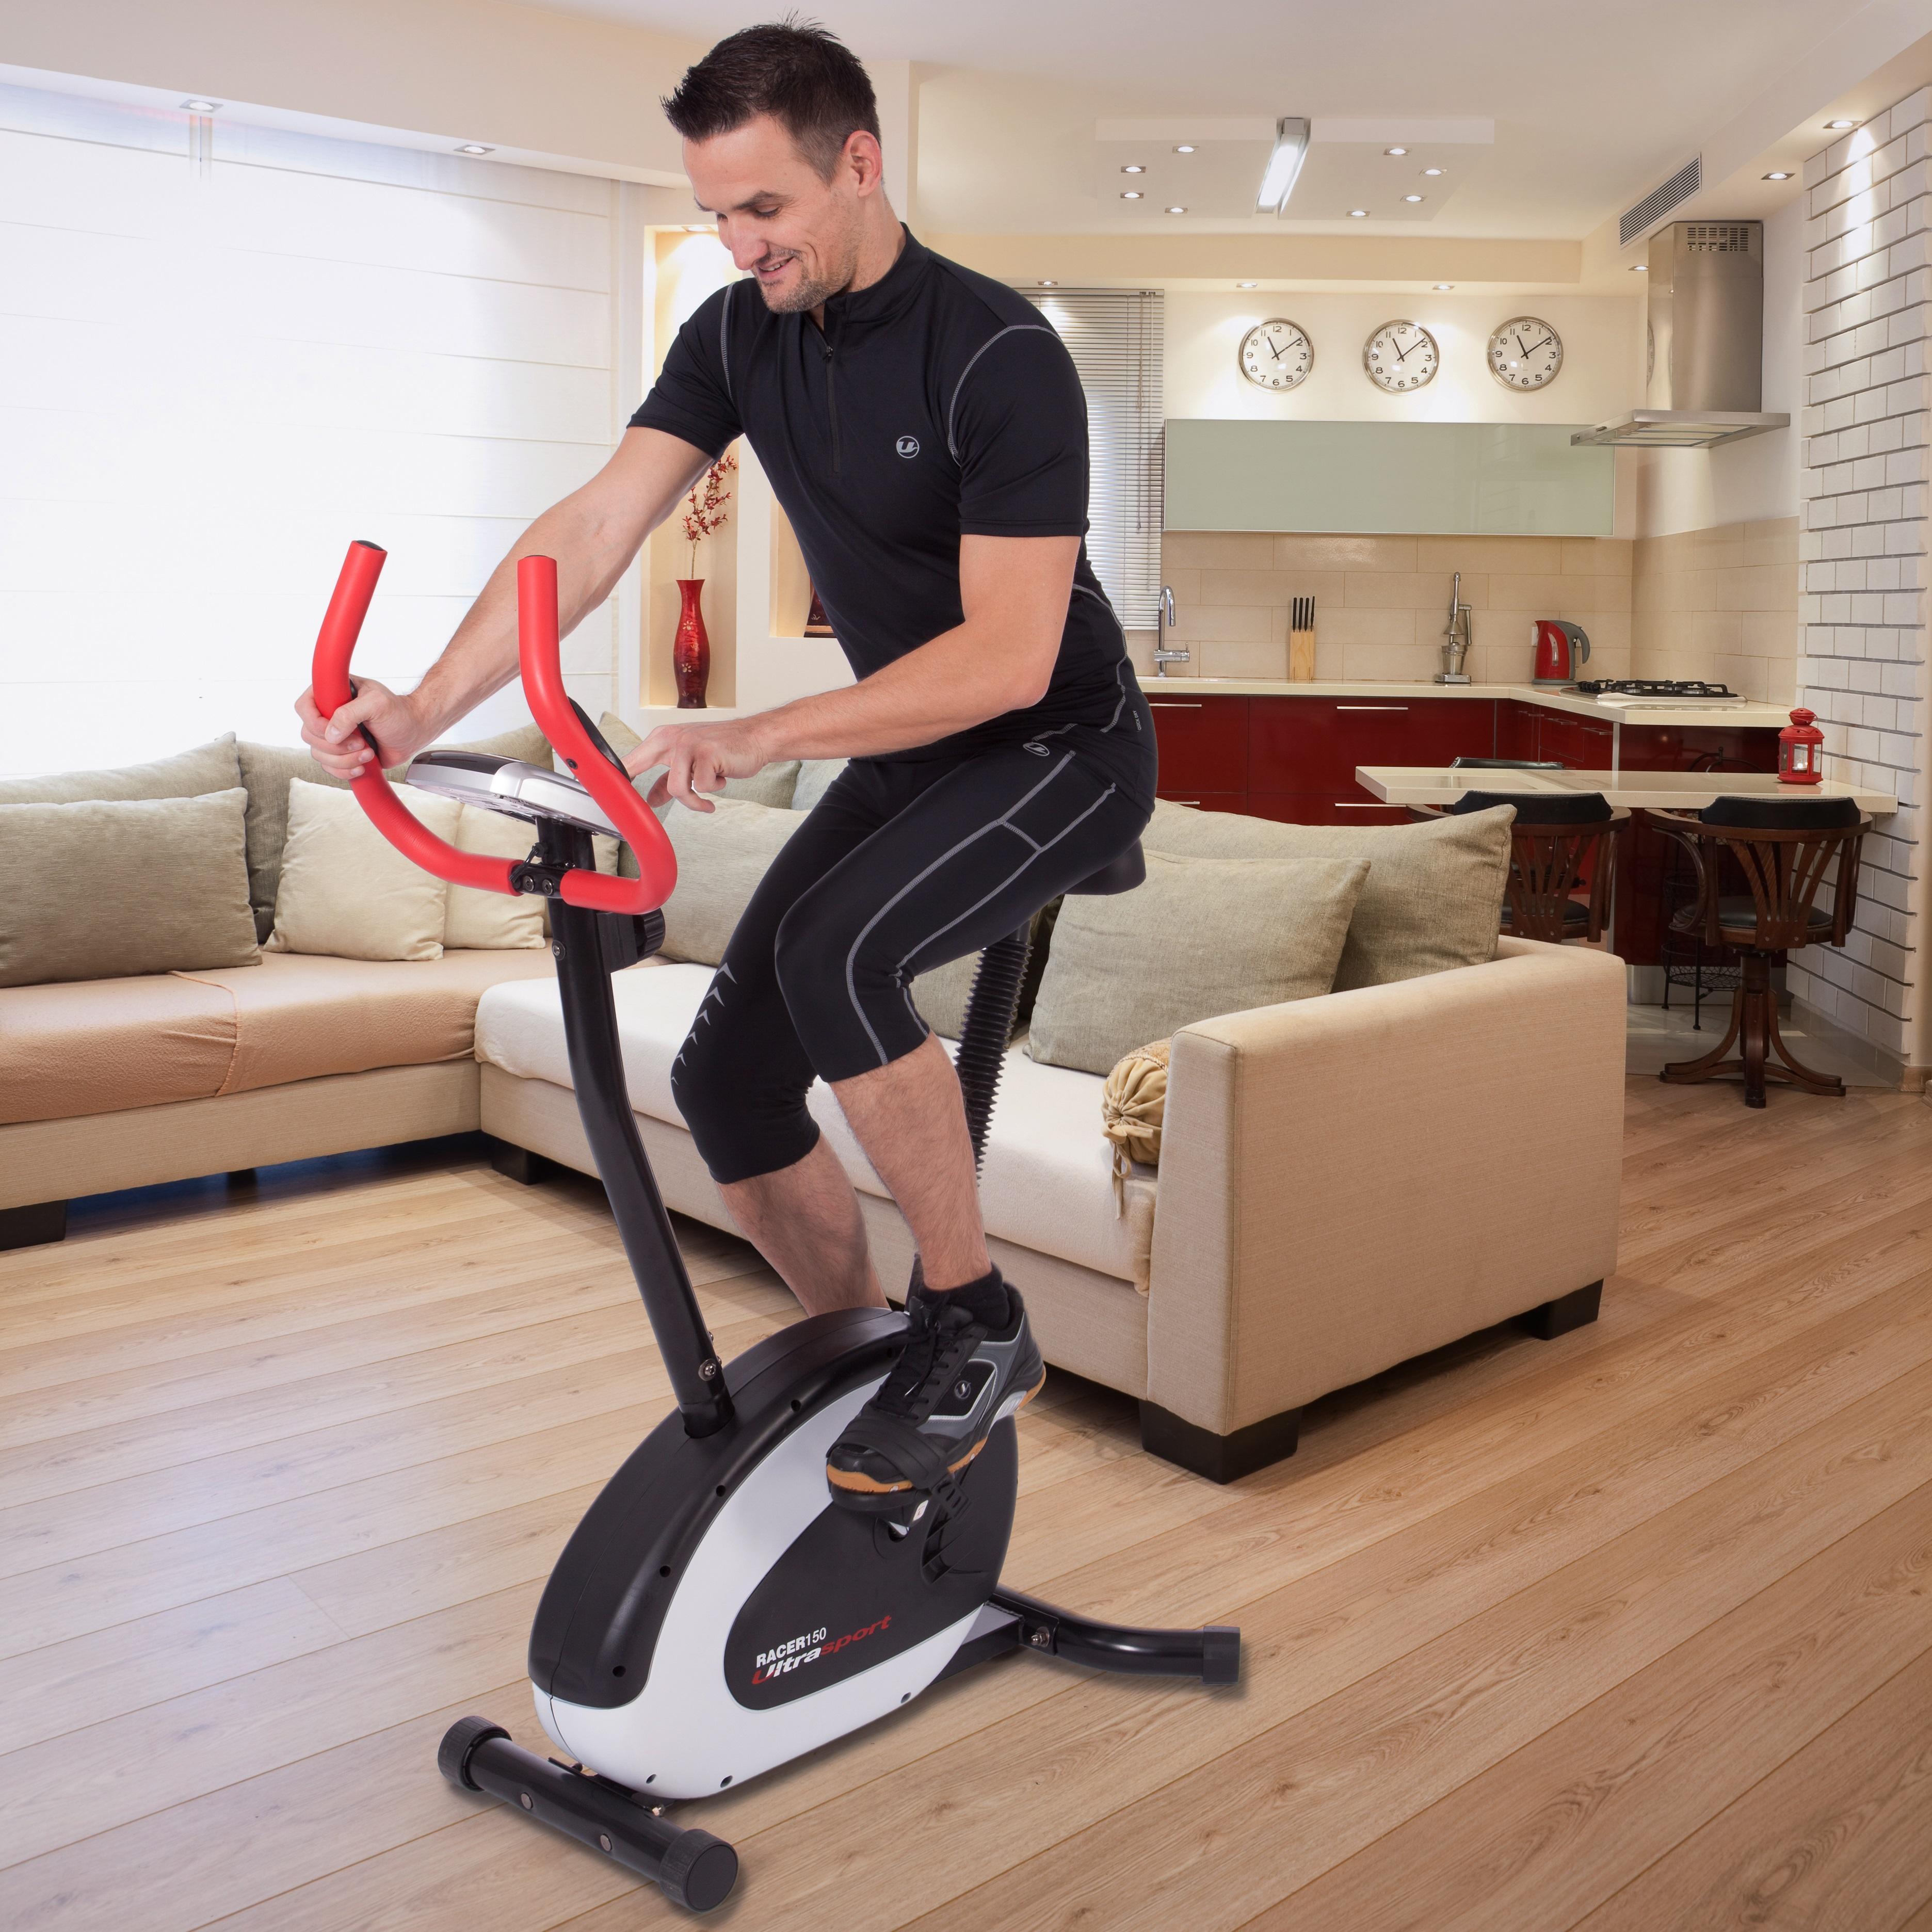 Ultrasport Bicicleta estática ergómetro, bicicleta fitness